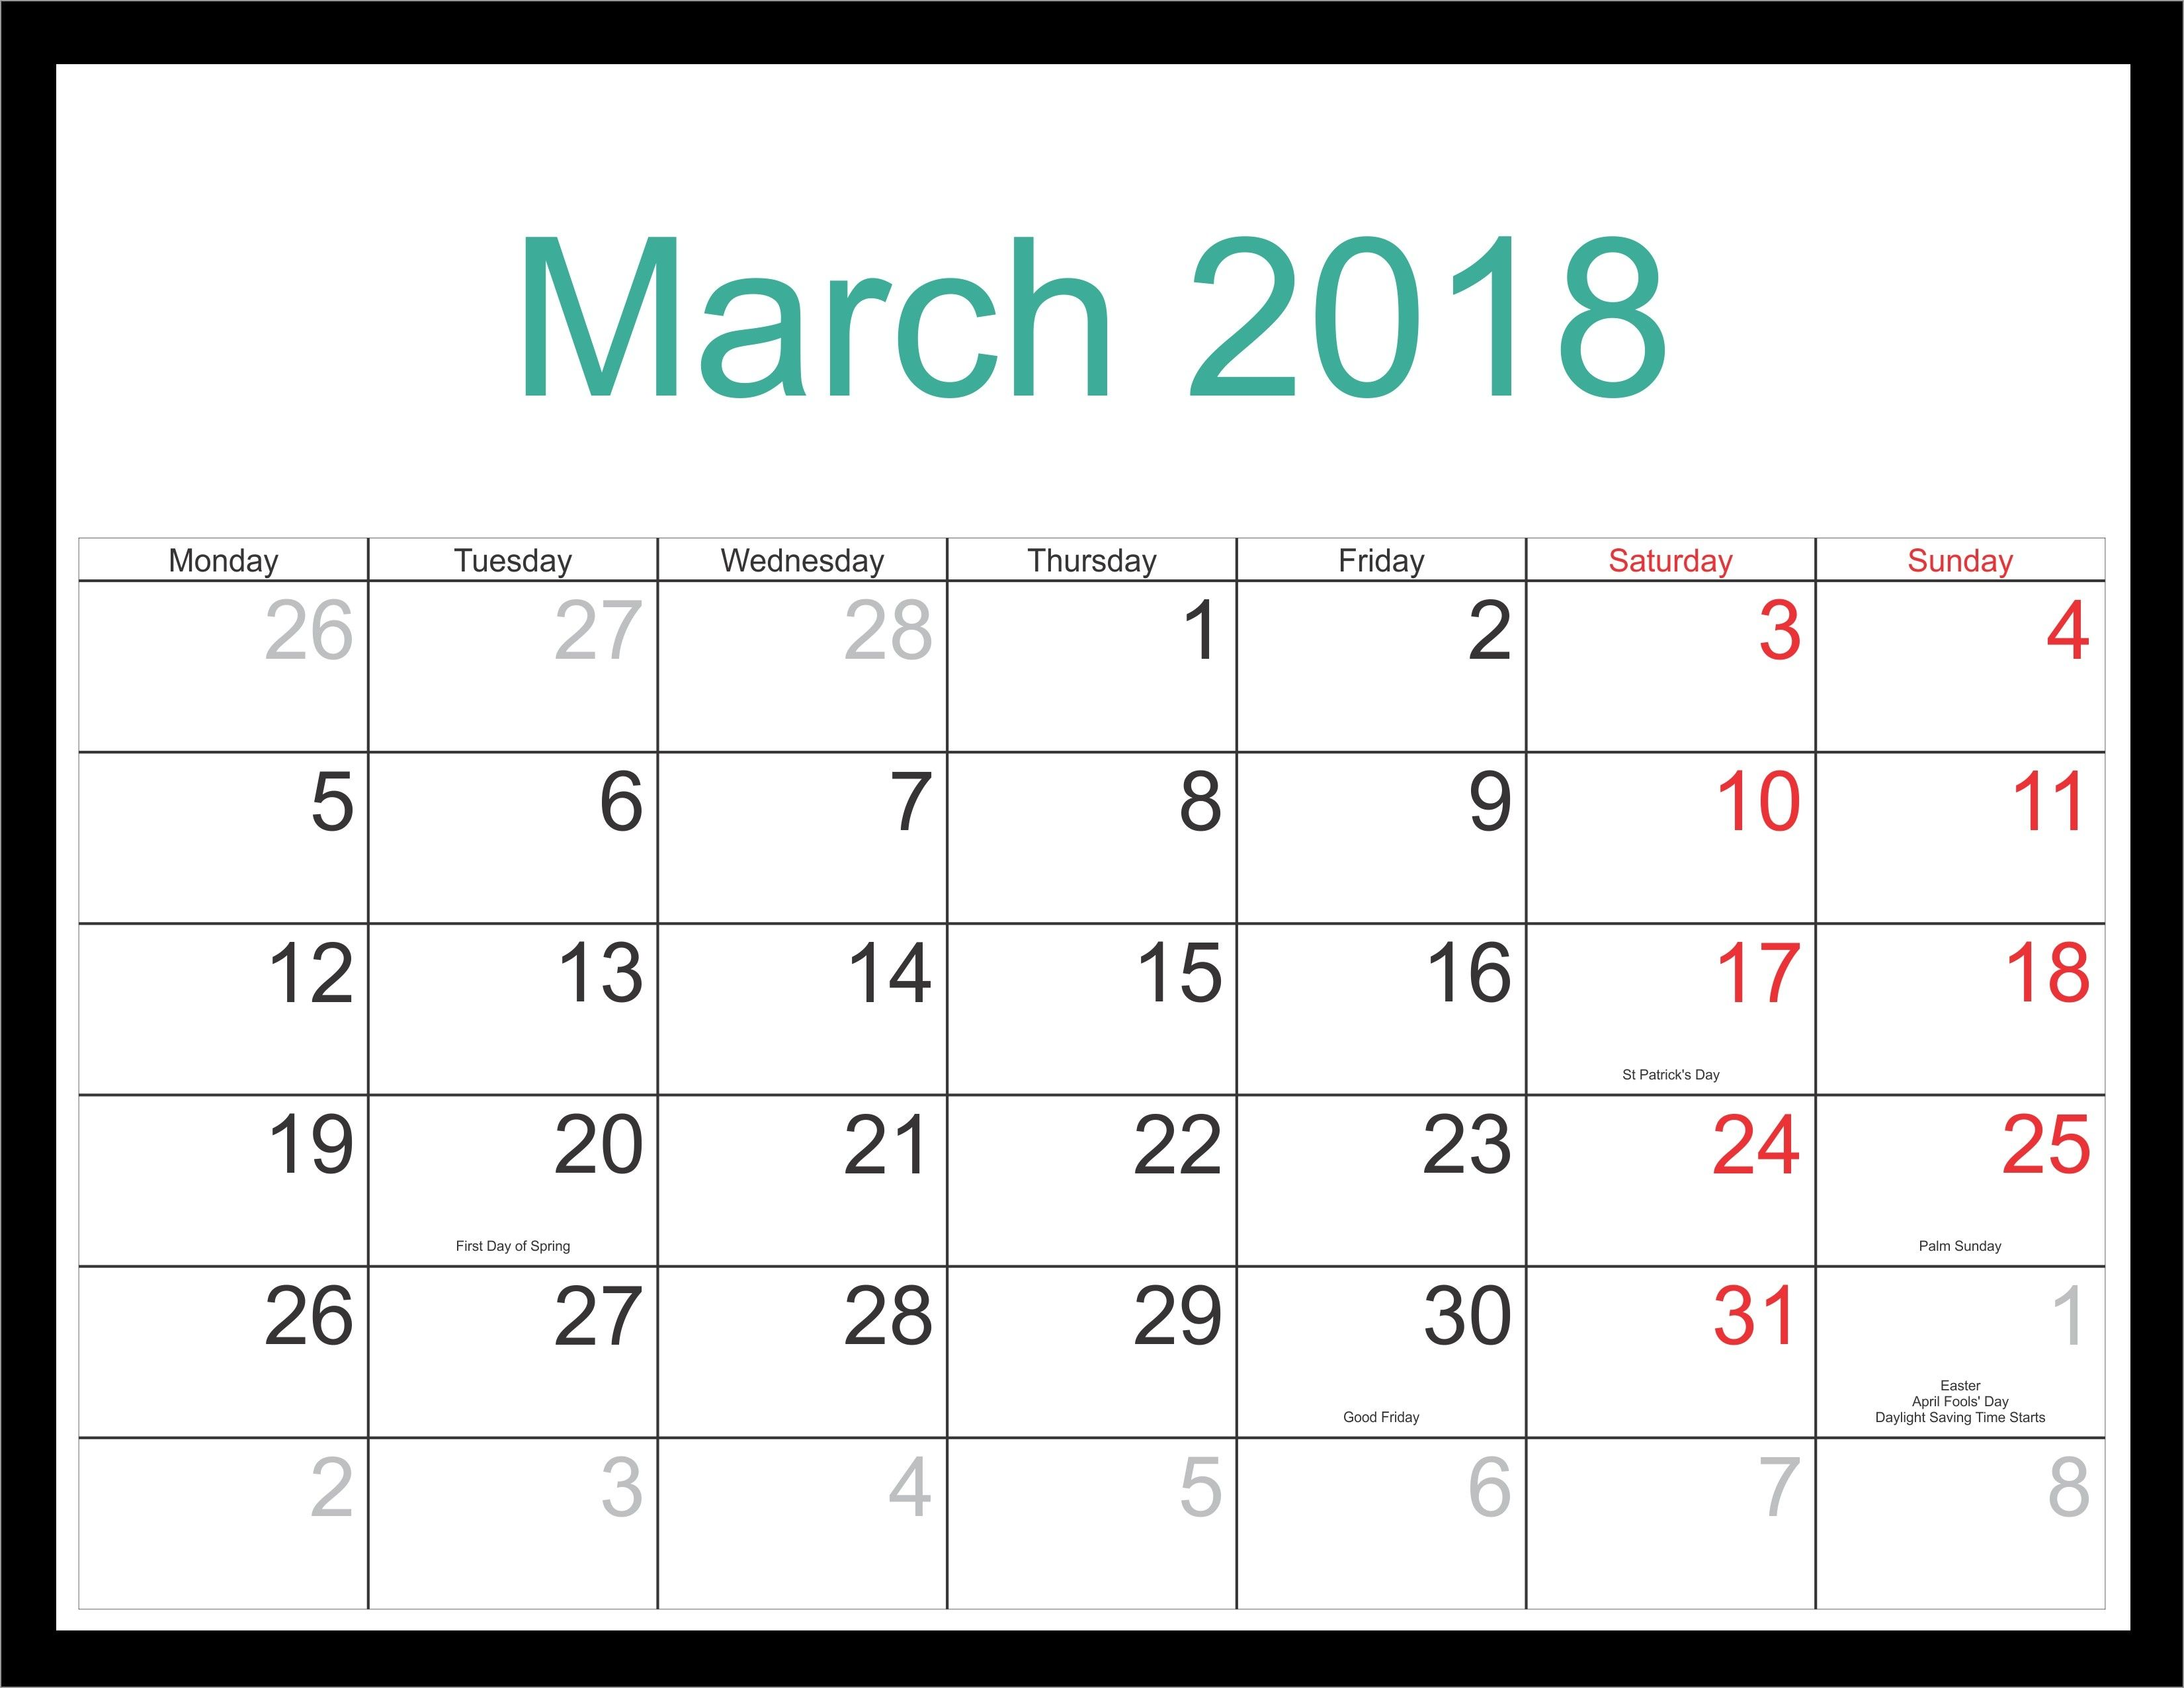 Calendar 2019 Hindu Panchang Free 5 March 2018 Calendar